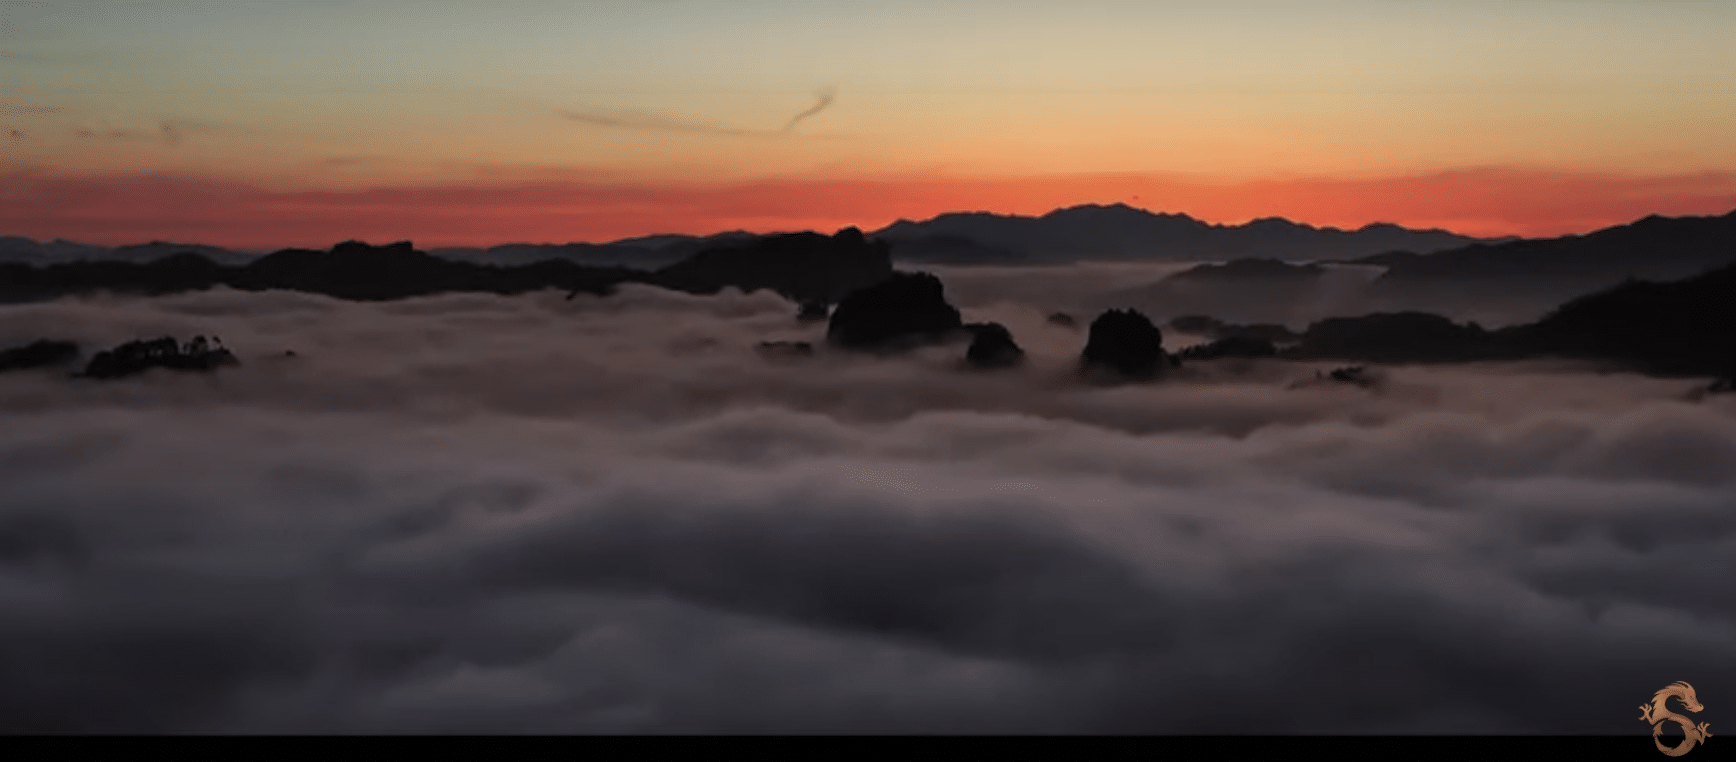 9 Dragons Tea Trailer A